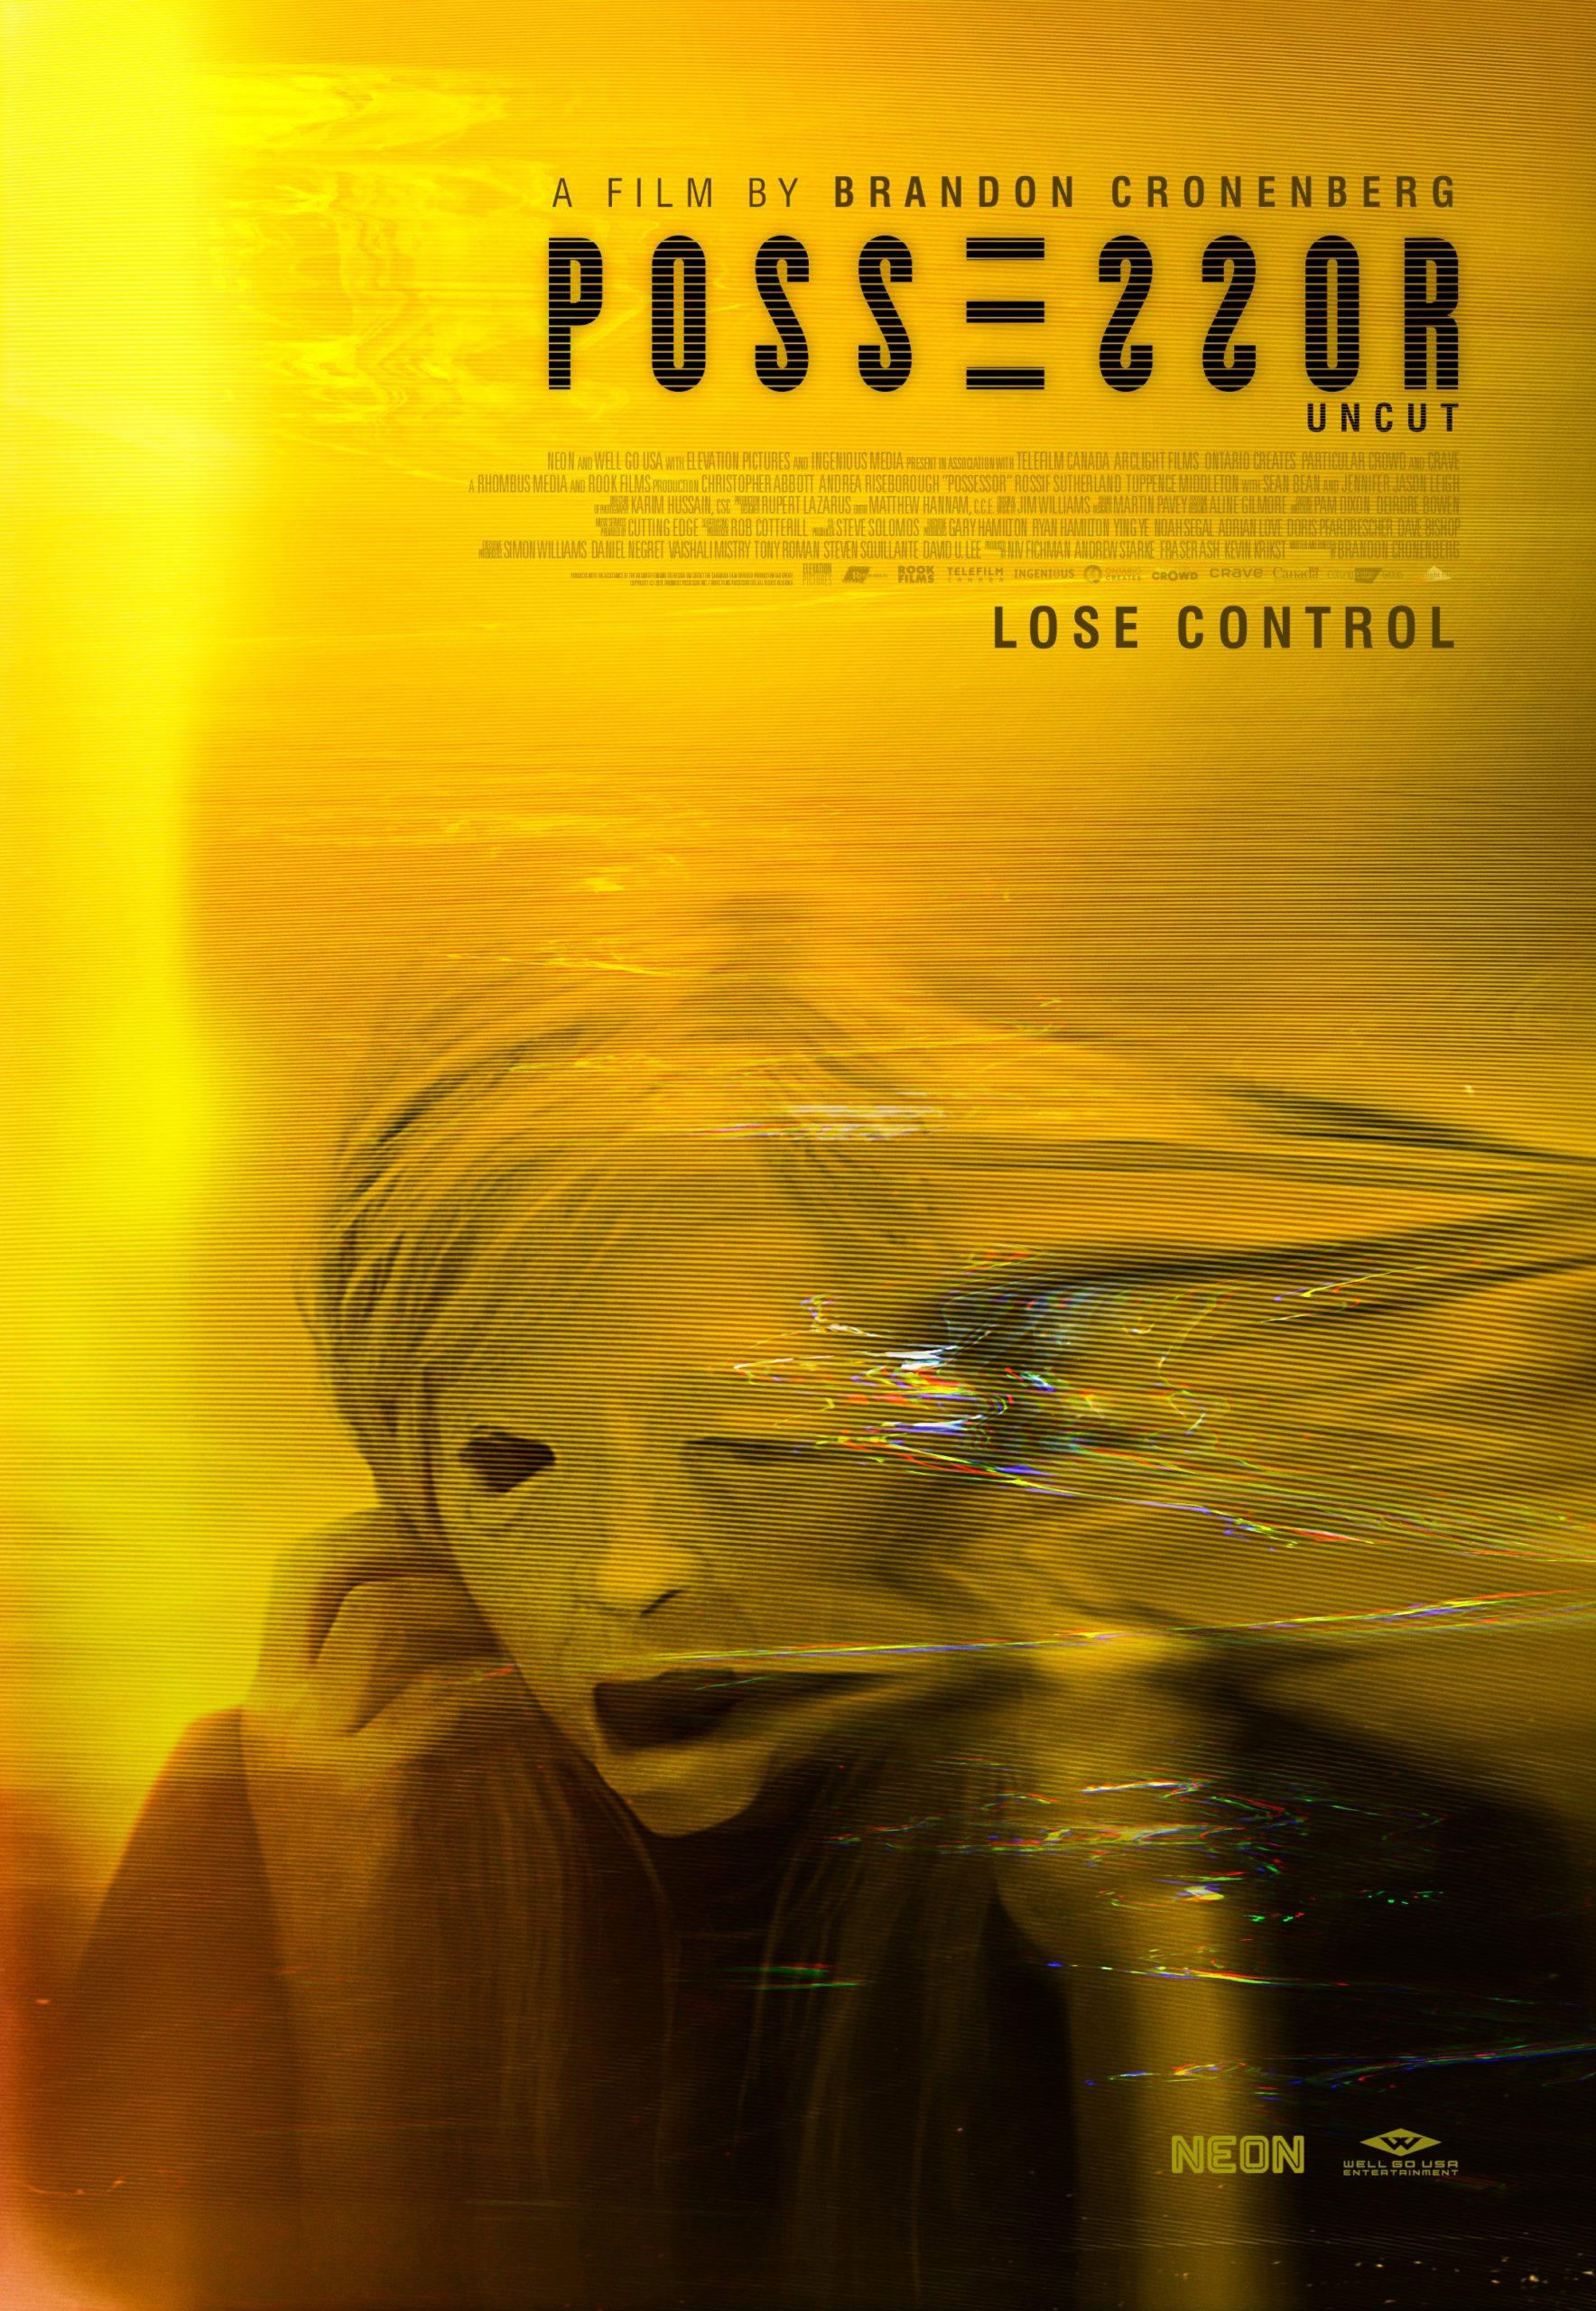 Possessor Uncut | Sidewalk Film Center & Cinema